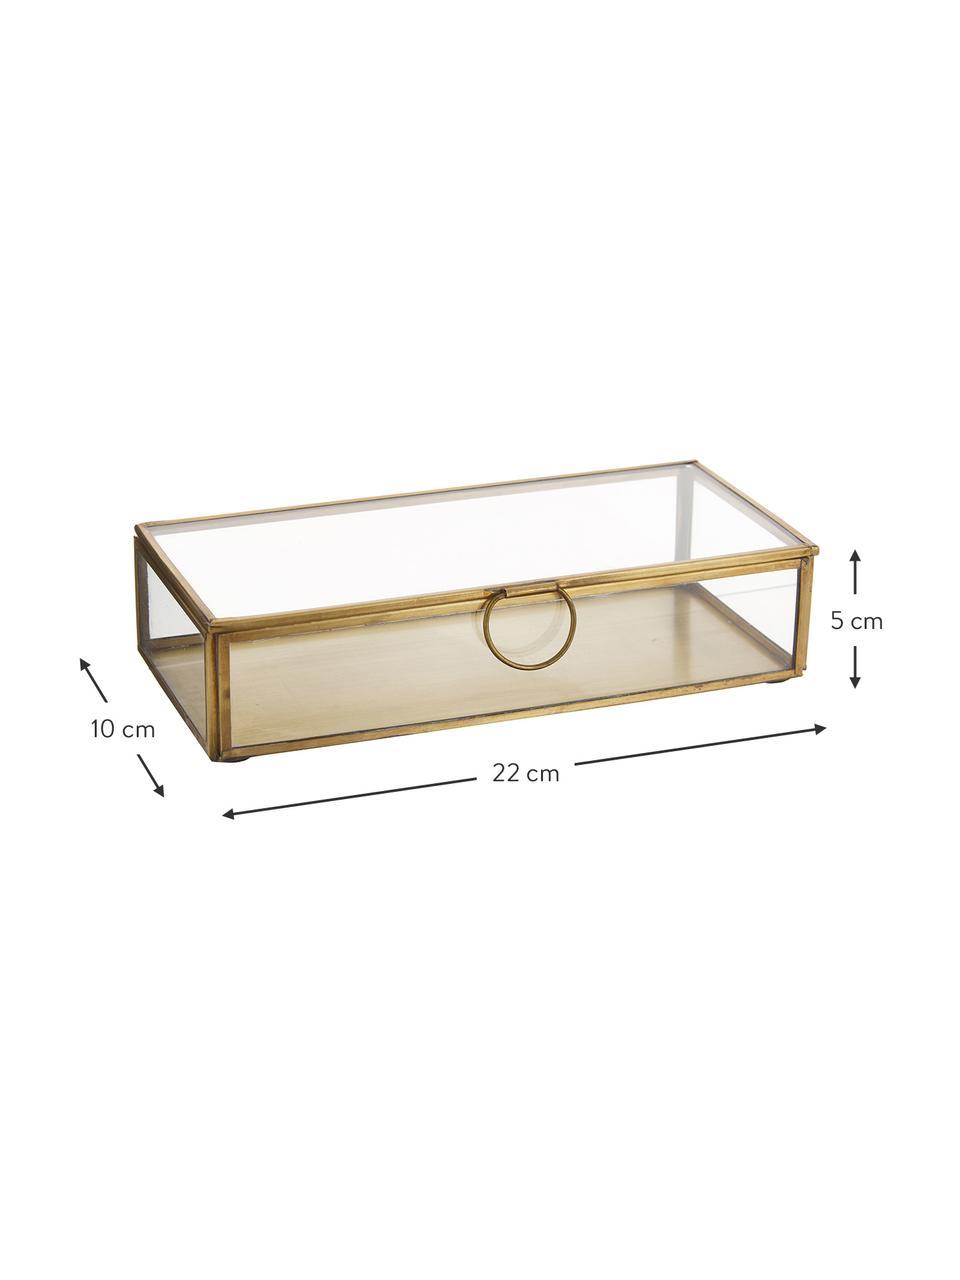 Aufbewahrungsbox Janni, Messing, Glas, Messing, B 22 x T 10 cm